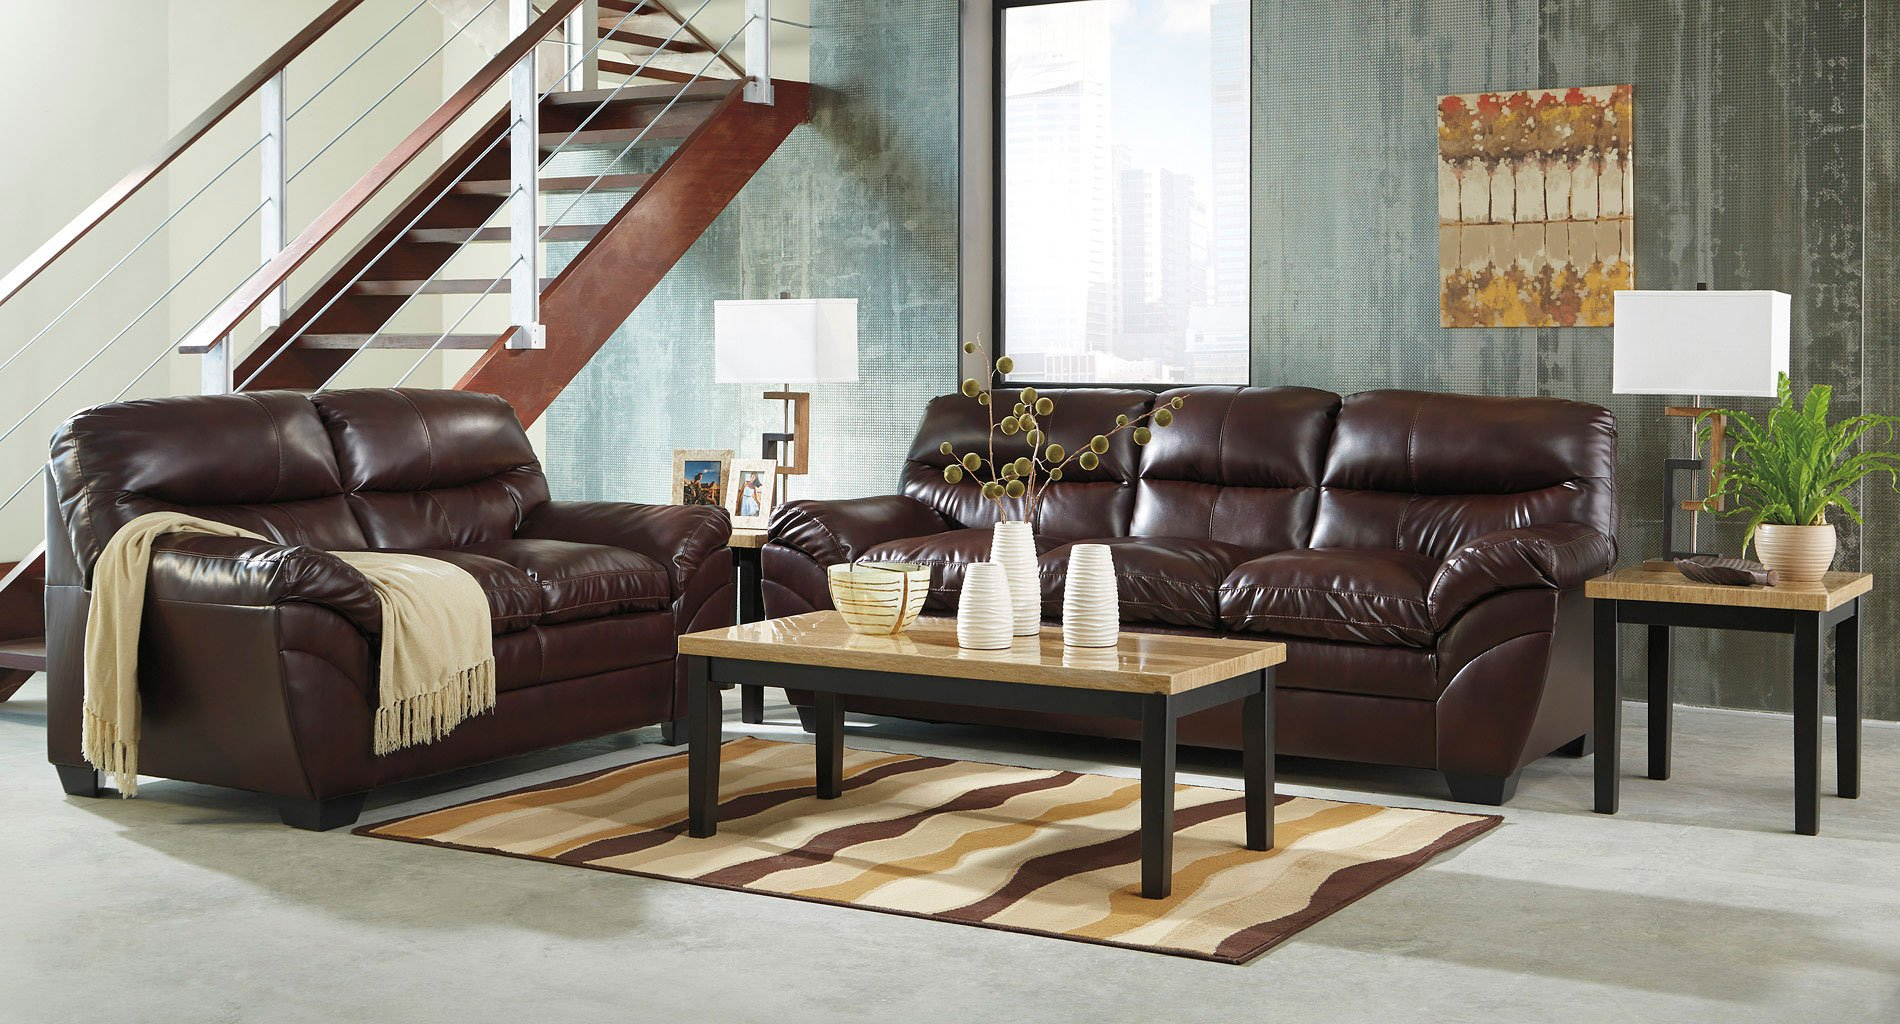 Tassler DuraBlend Mahogany Living Room Set By Signature